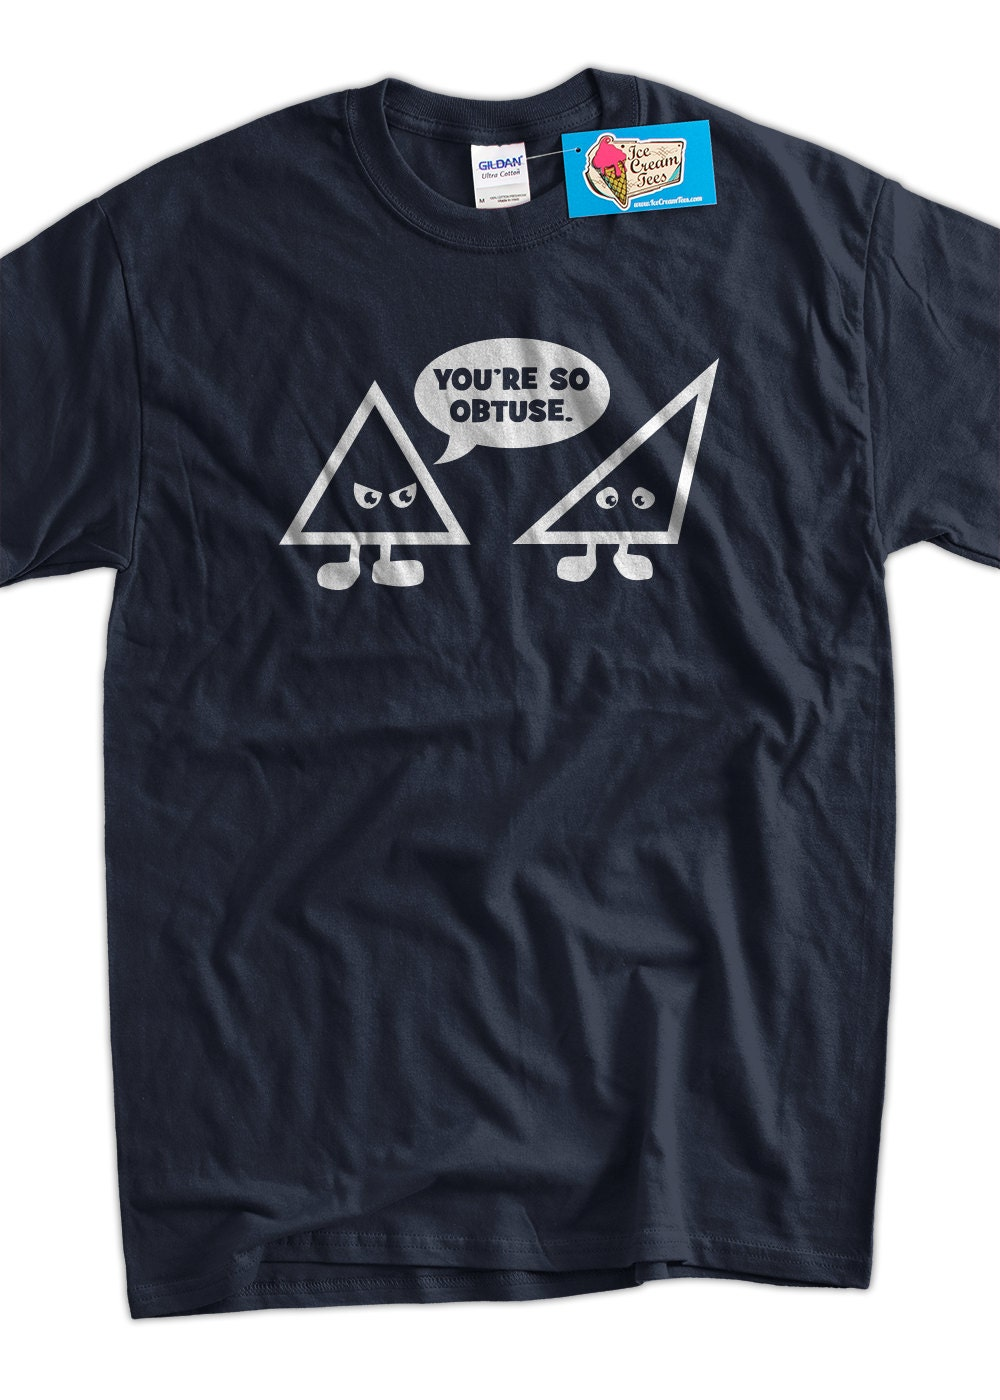 Mens Shirt With Tiny Designs